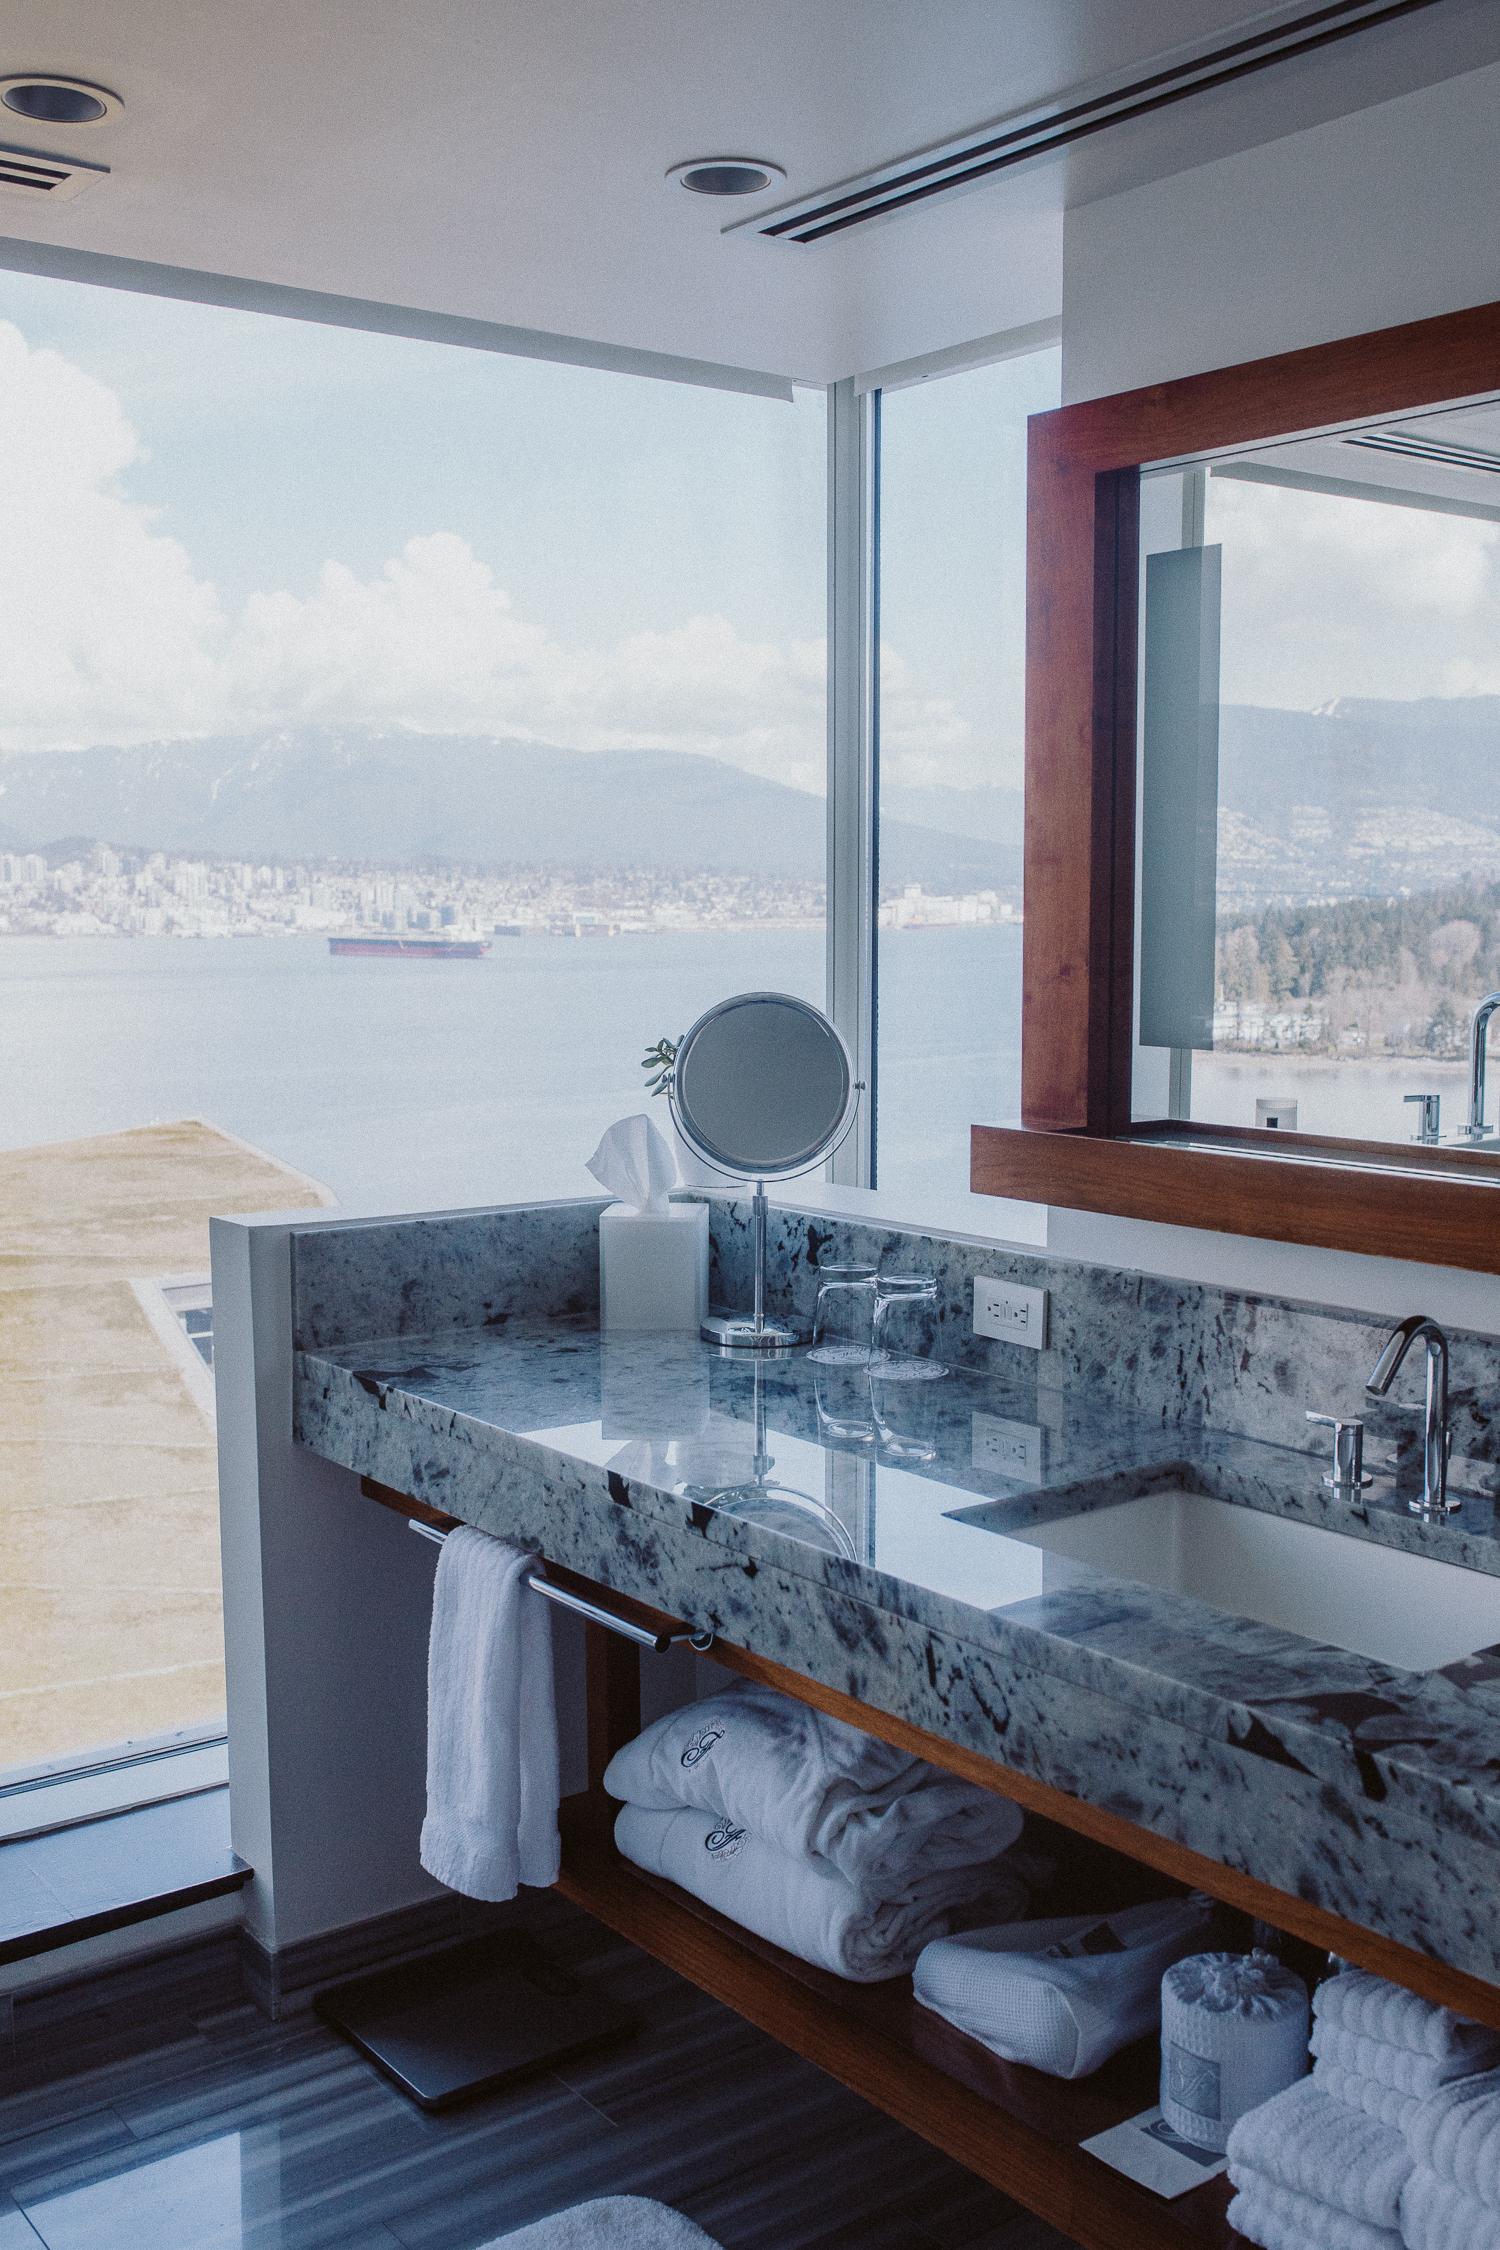 Fairmont Pacific Rim Hotel Review, Vancouver Hotels | Bikinis & Passports